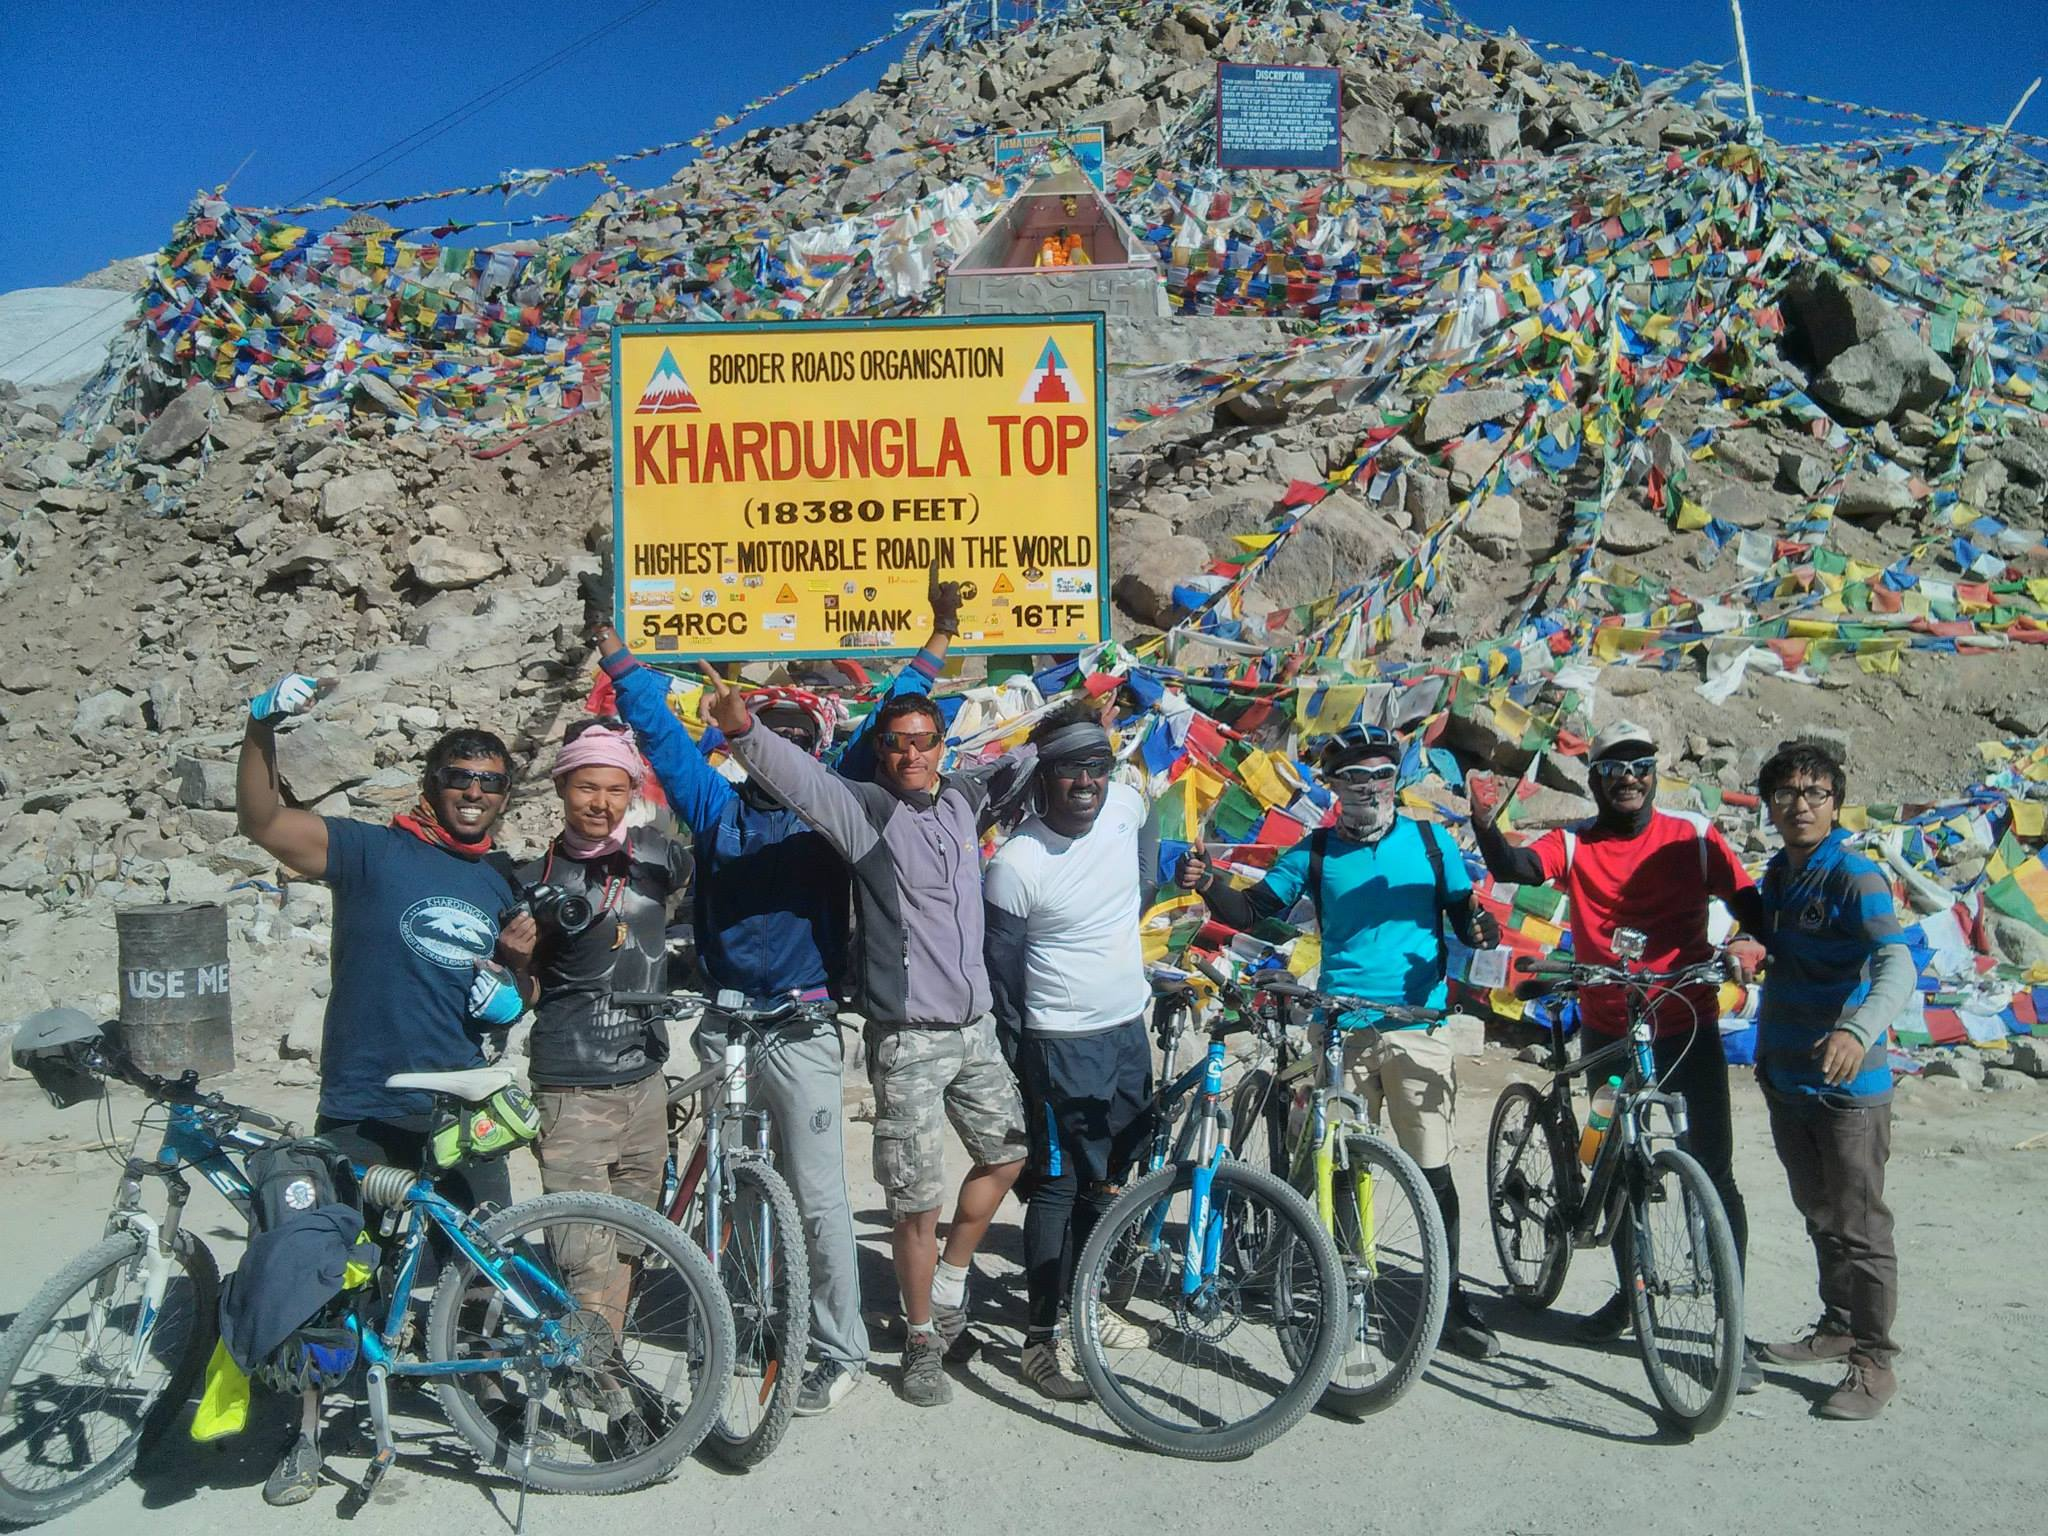 Cyclists from Bangalore at Khardungla Top